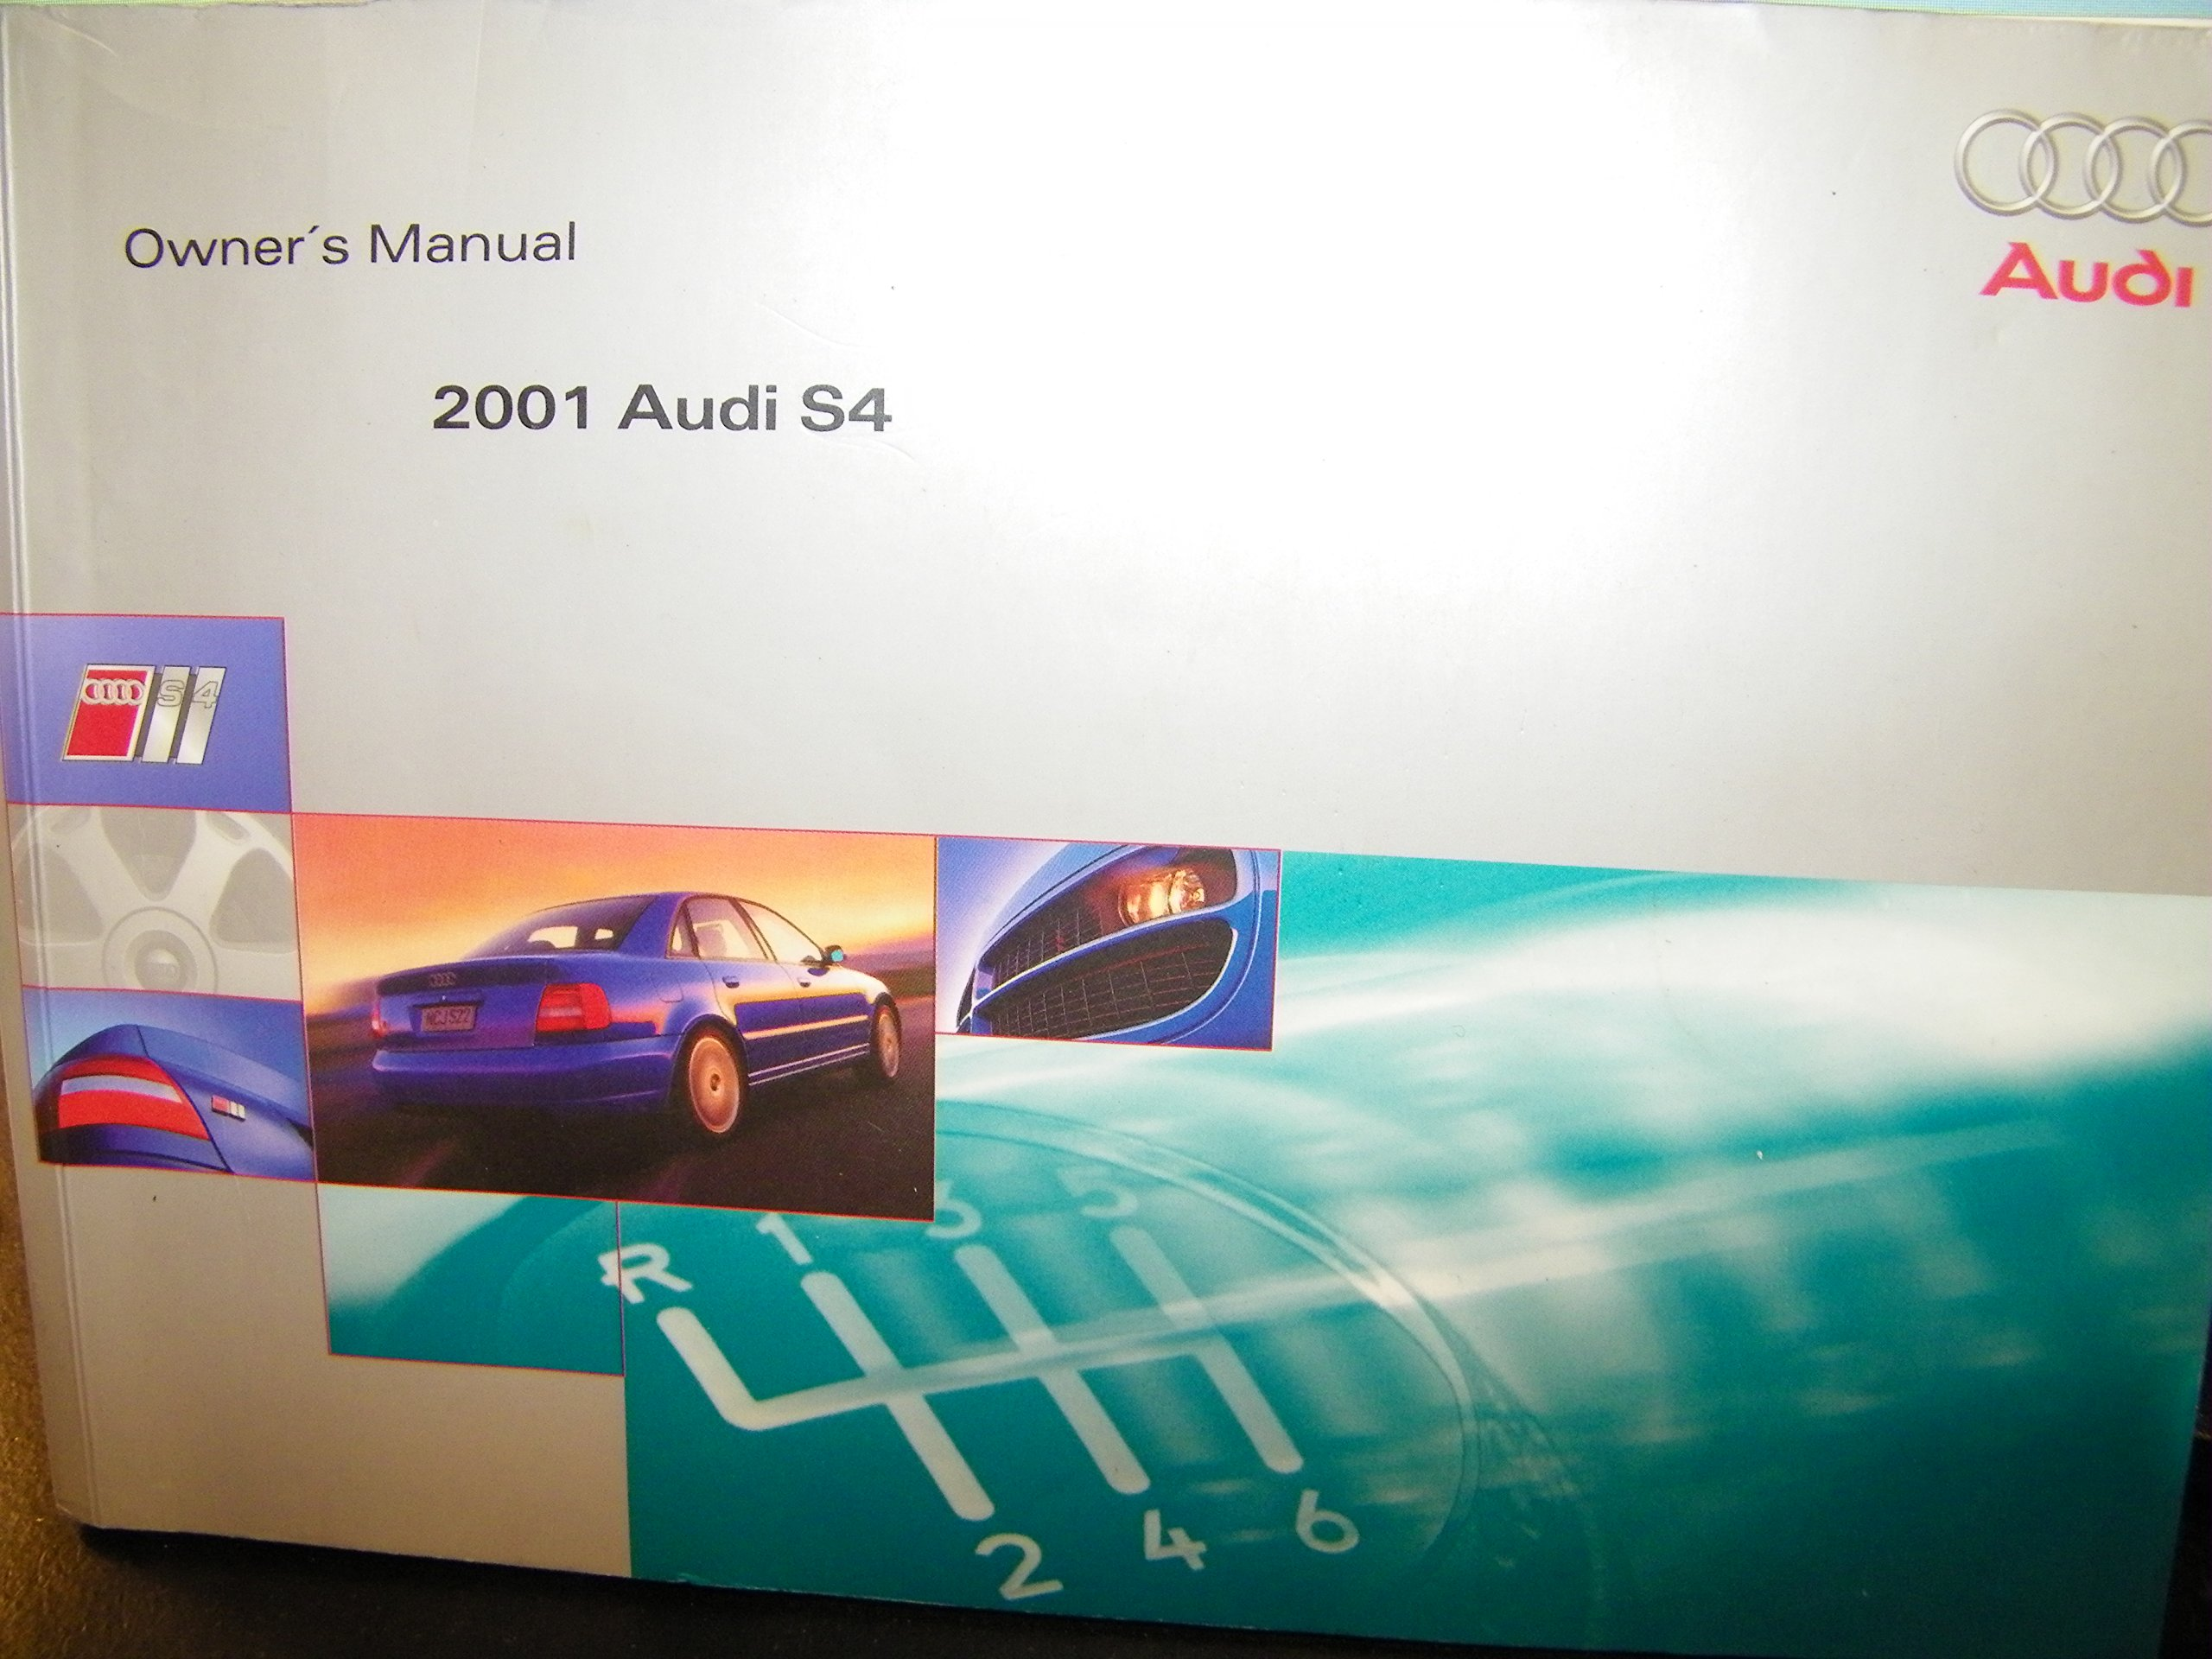 2001 audi s4 s 4 owners manual audi amazon com books rh amazon com audi s4 owners manual 2014 audi s4 owners manual pdf